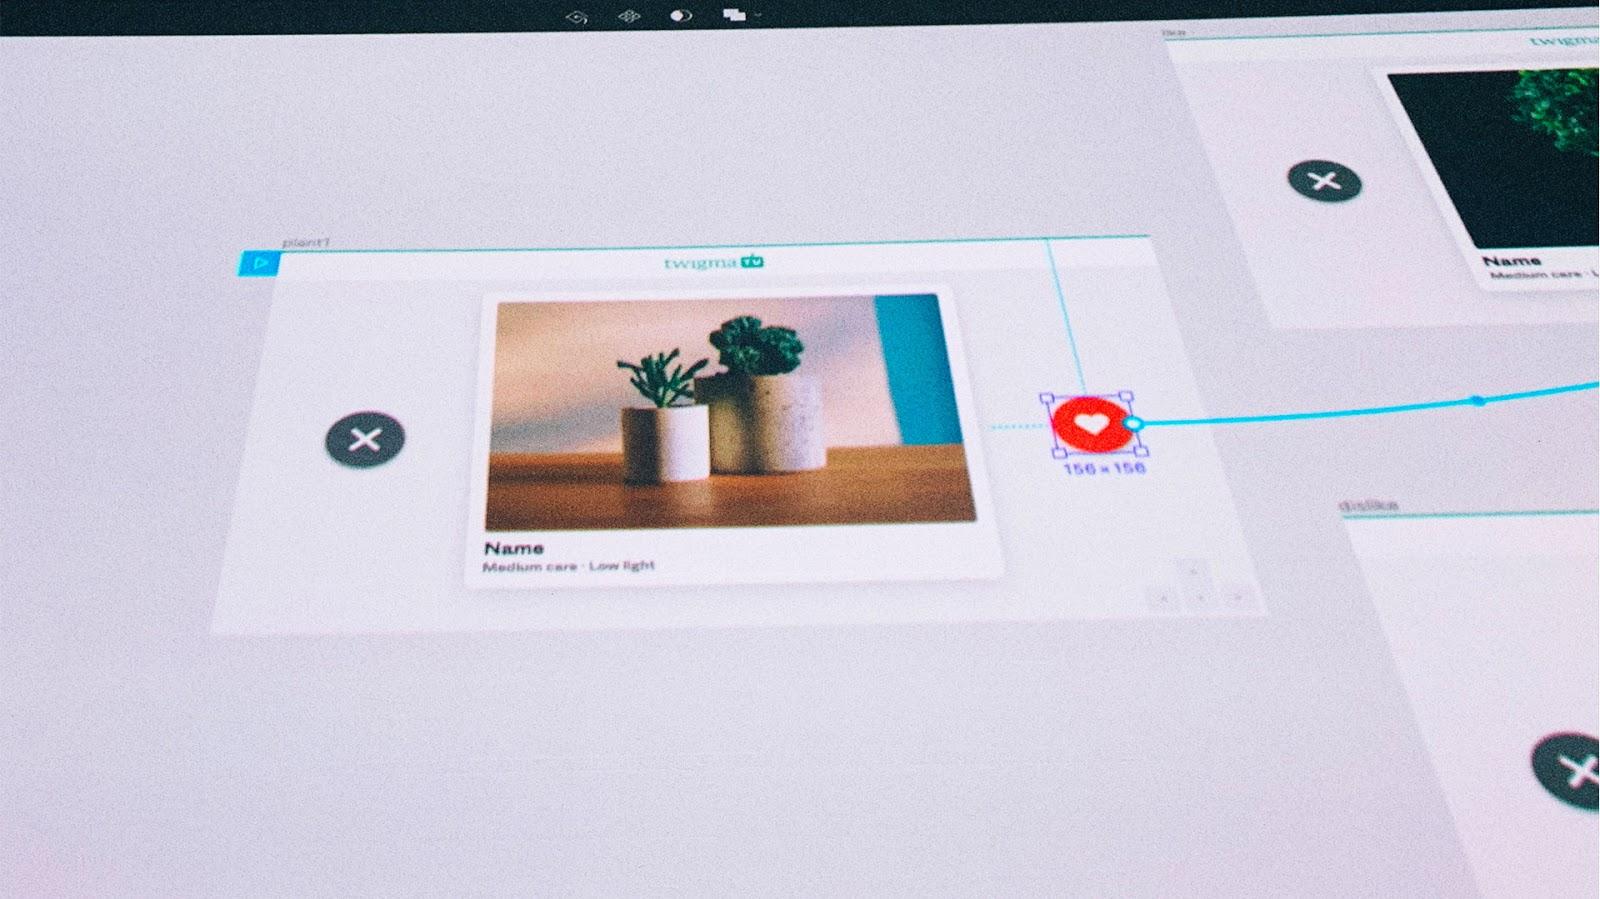 Display of Figma's prototyping skills.